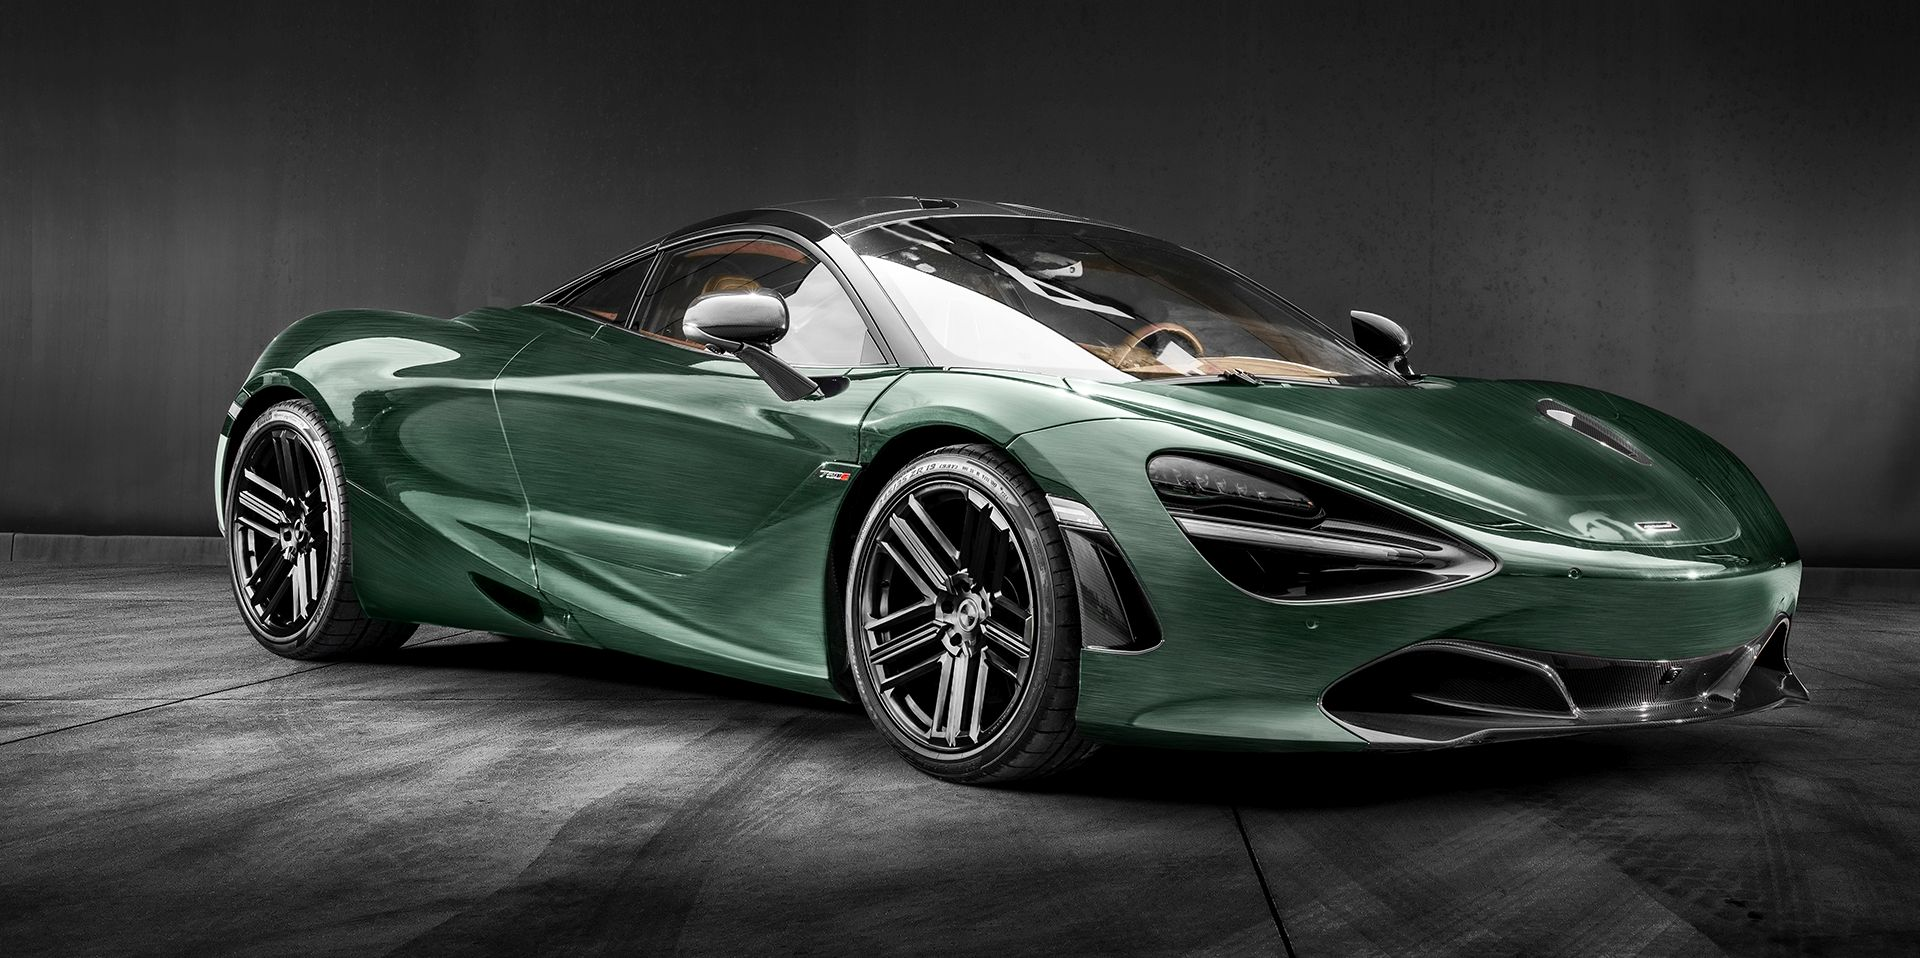 McLaren-720S-by-Carlex-Design-1